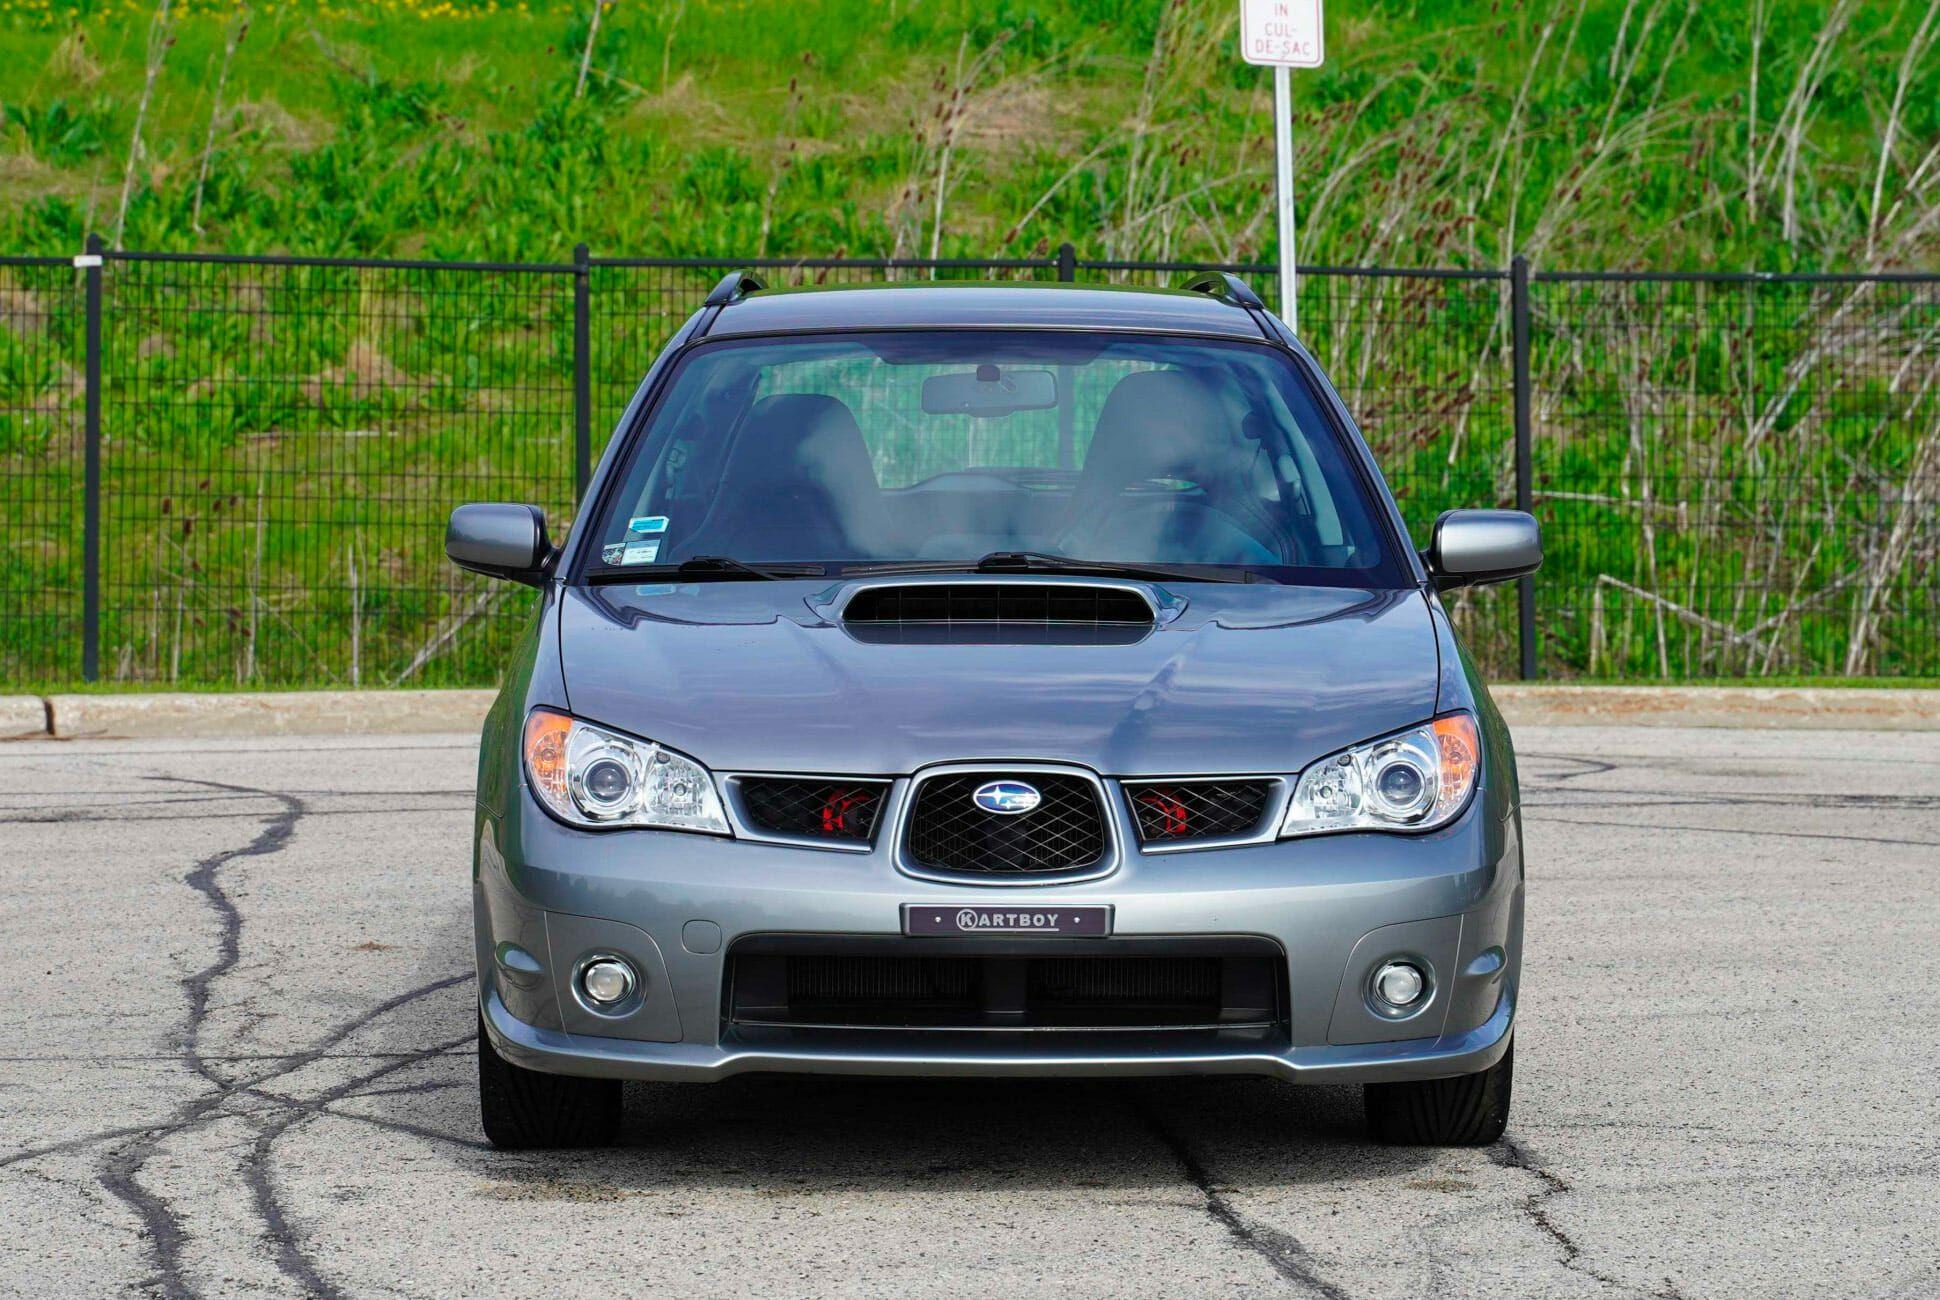 2007-Subaru-WRX-Wagon-14K-Miles-gear-patrol-slide-5